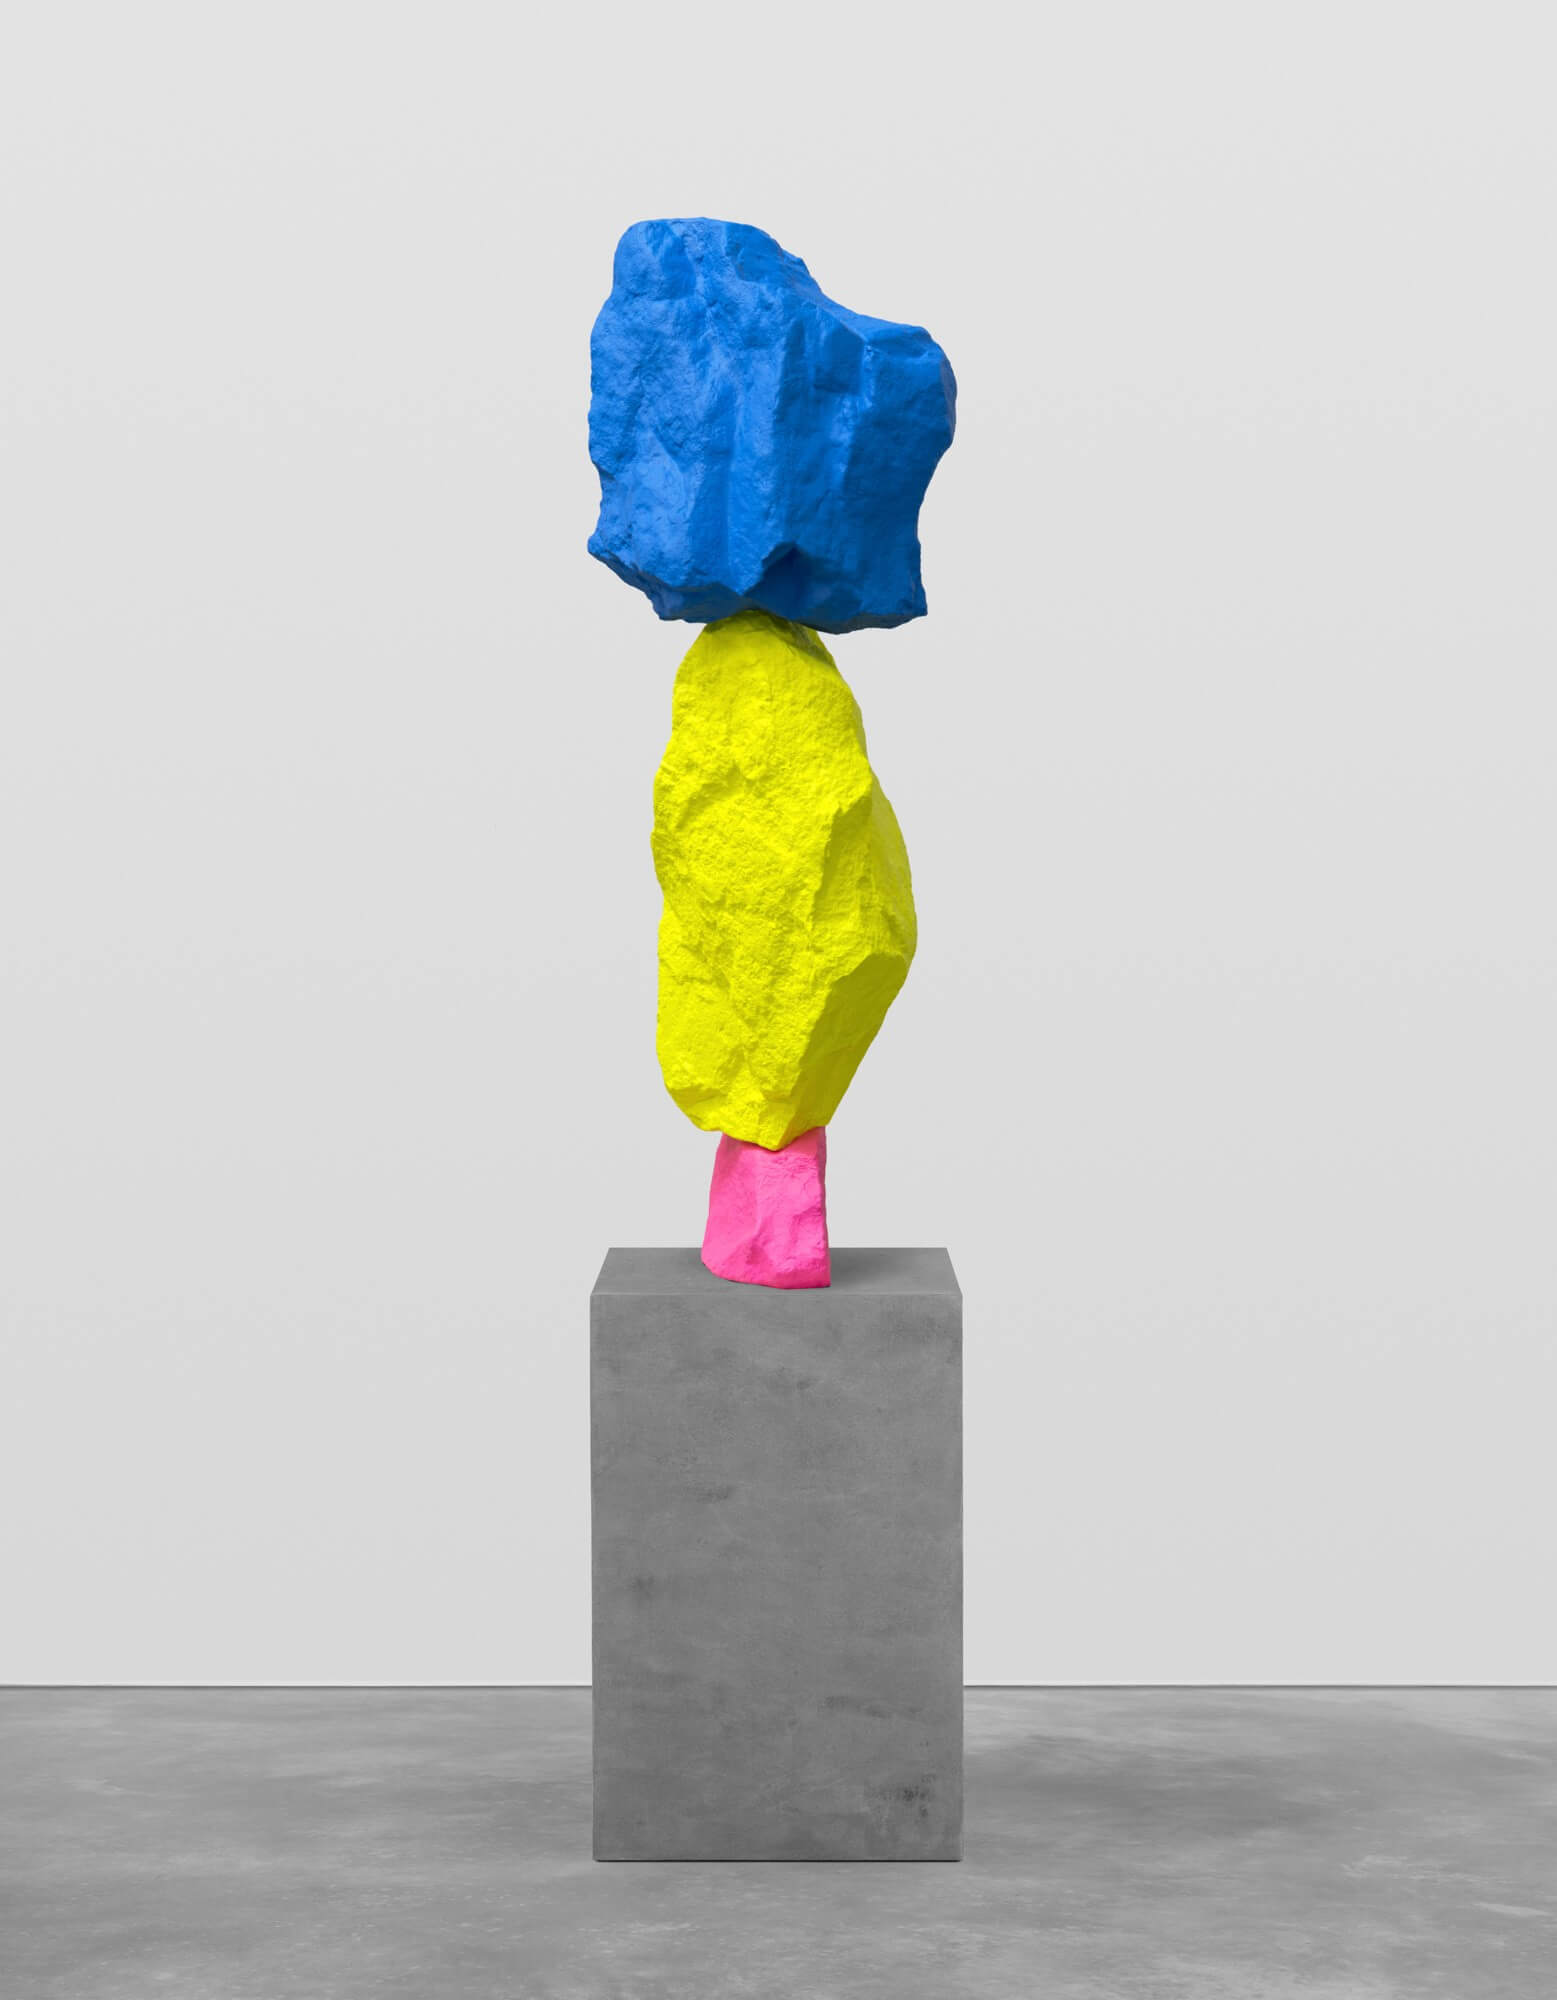 pink yellow blue mountain | UGO RONDINONE